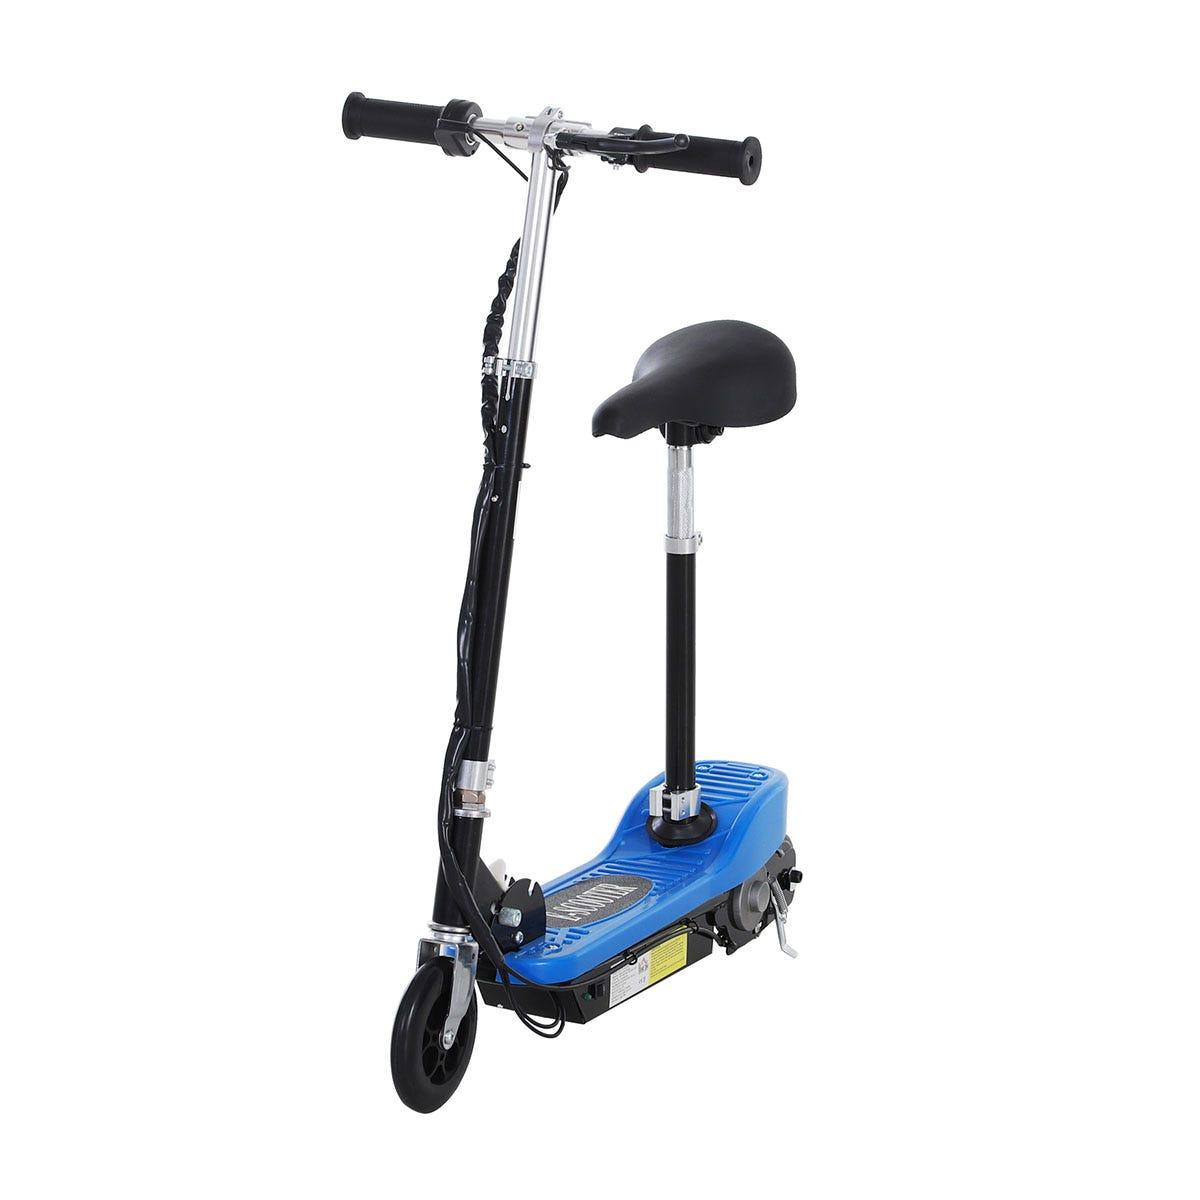 Reiten Kids Foldable E Scooter Electric 120W Toy w/ Brake Kickstand - Blue